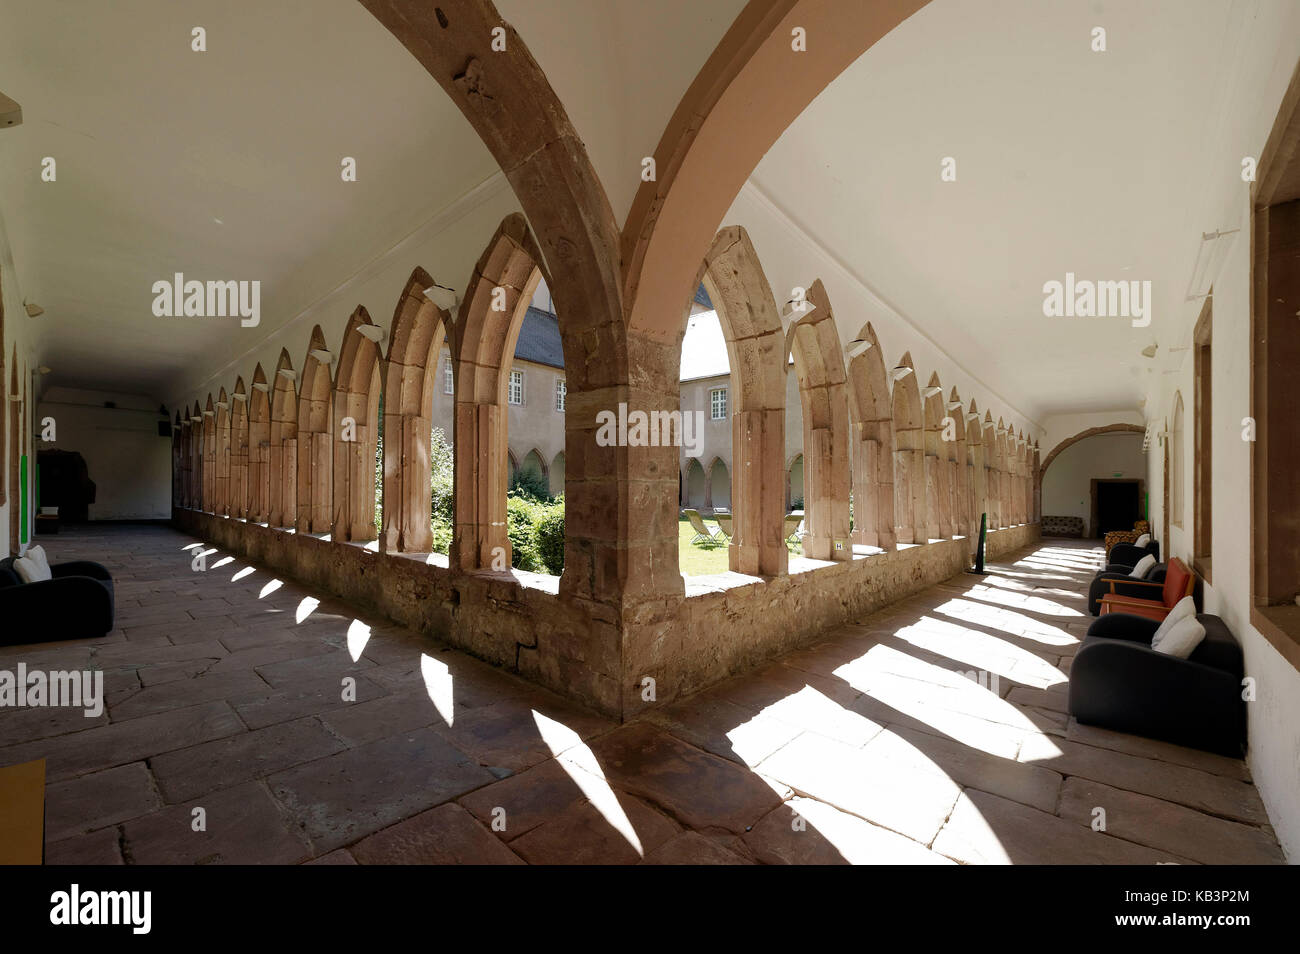 France, Haut-Rhin, Guebwiller, les Dominicains de Haute-Alsace, the cloister Stock Photo